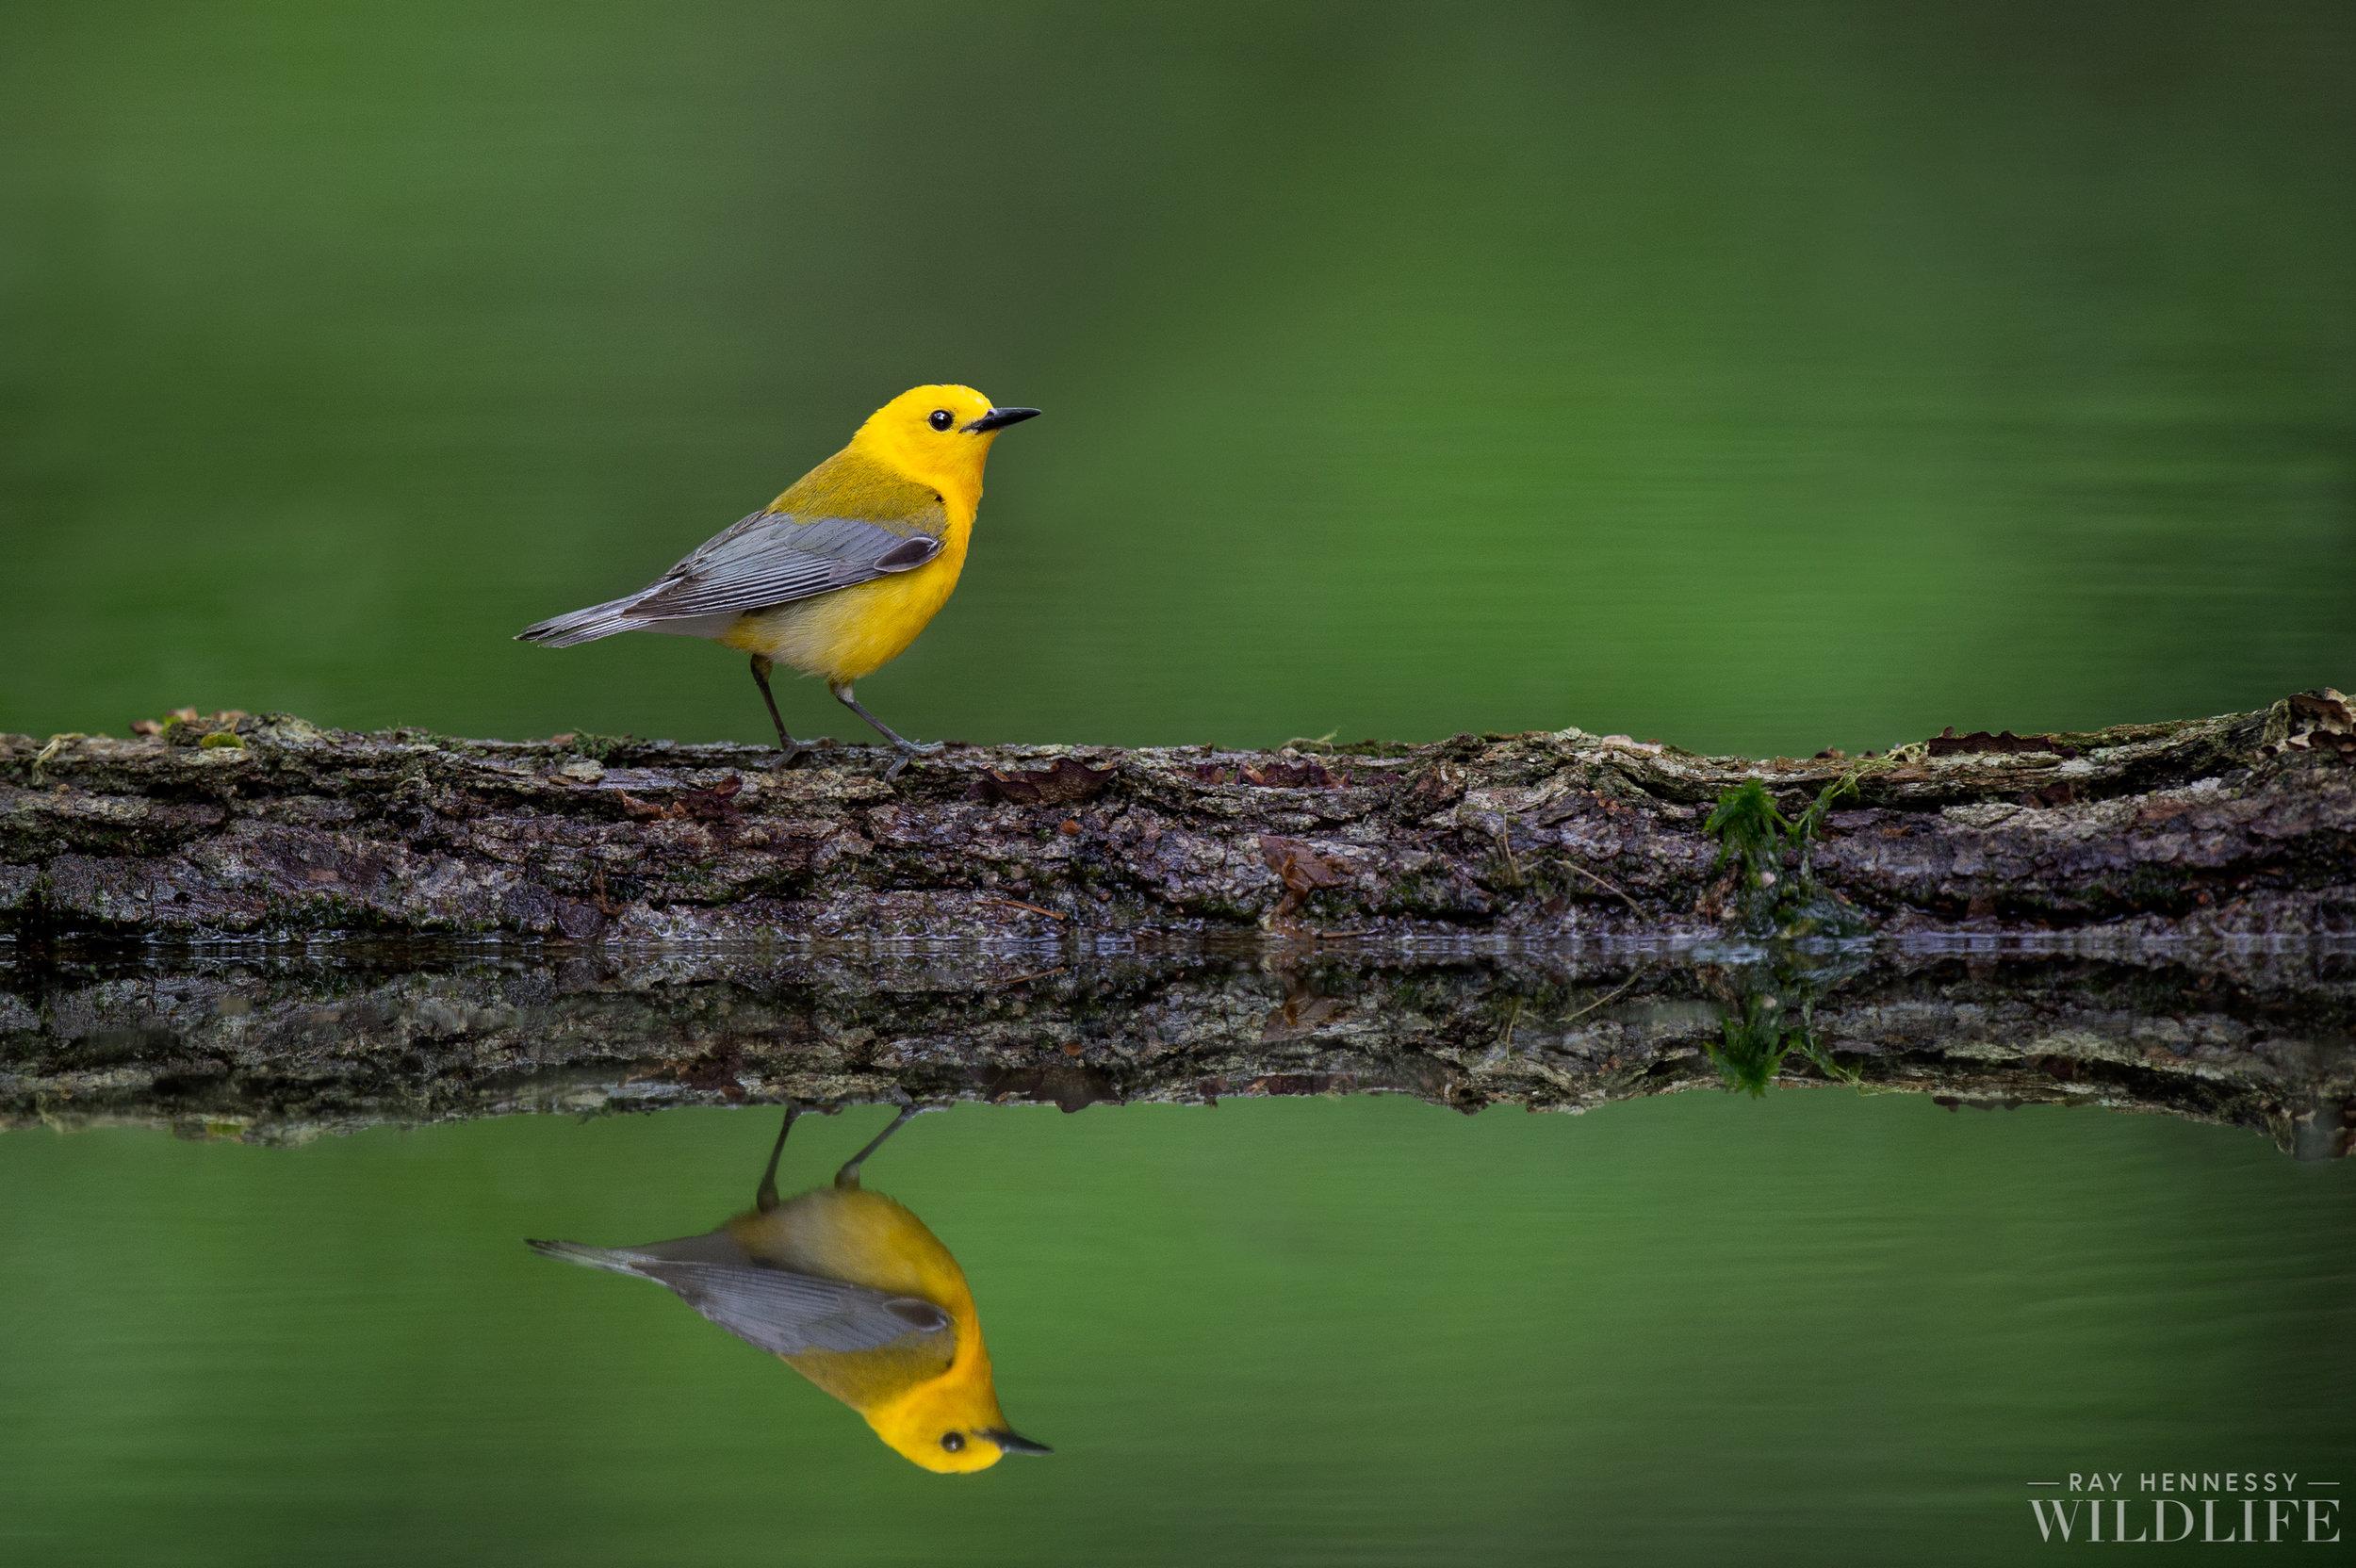 005_Prothonotary Warbler.jpg